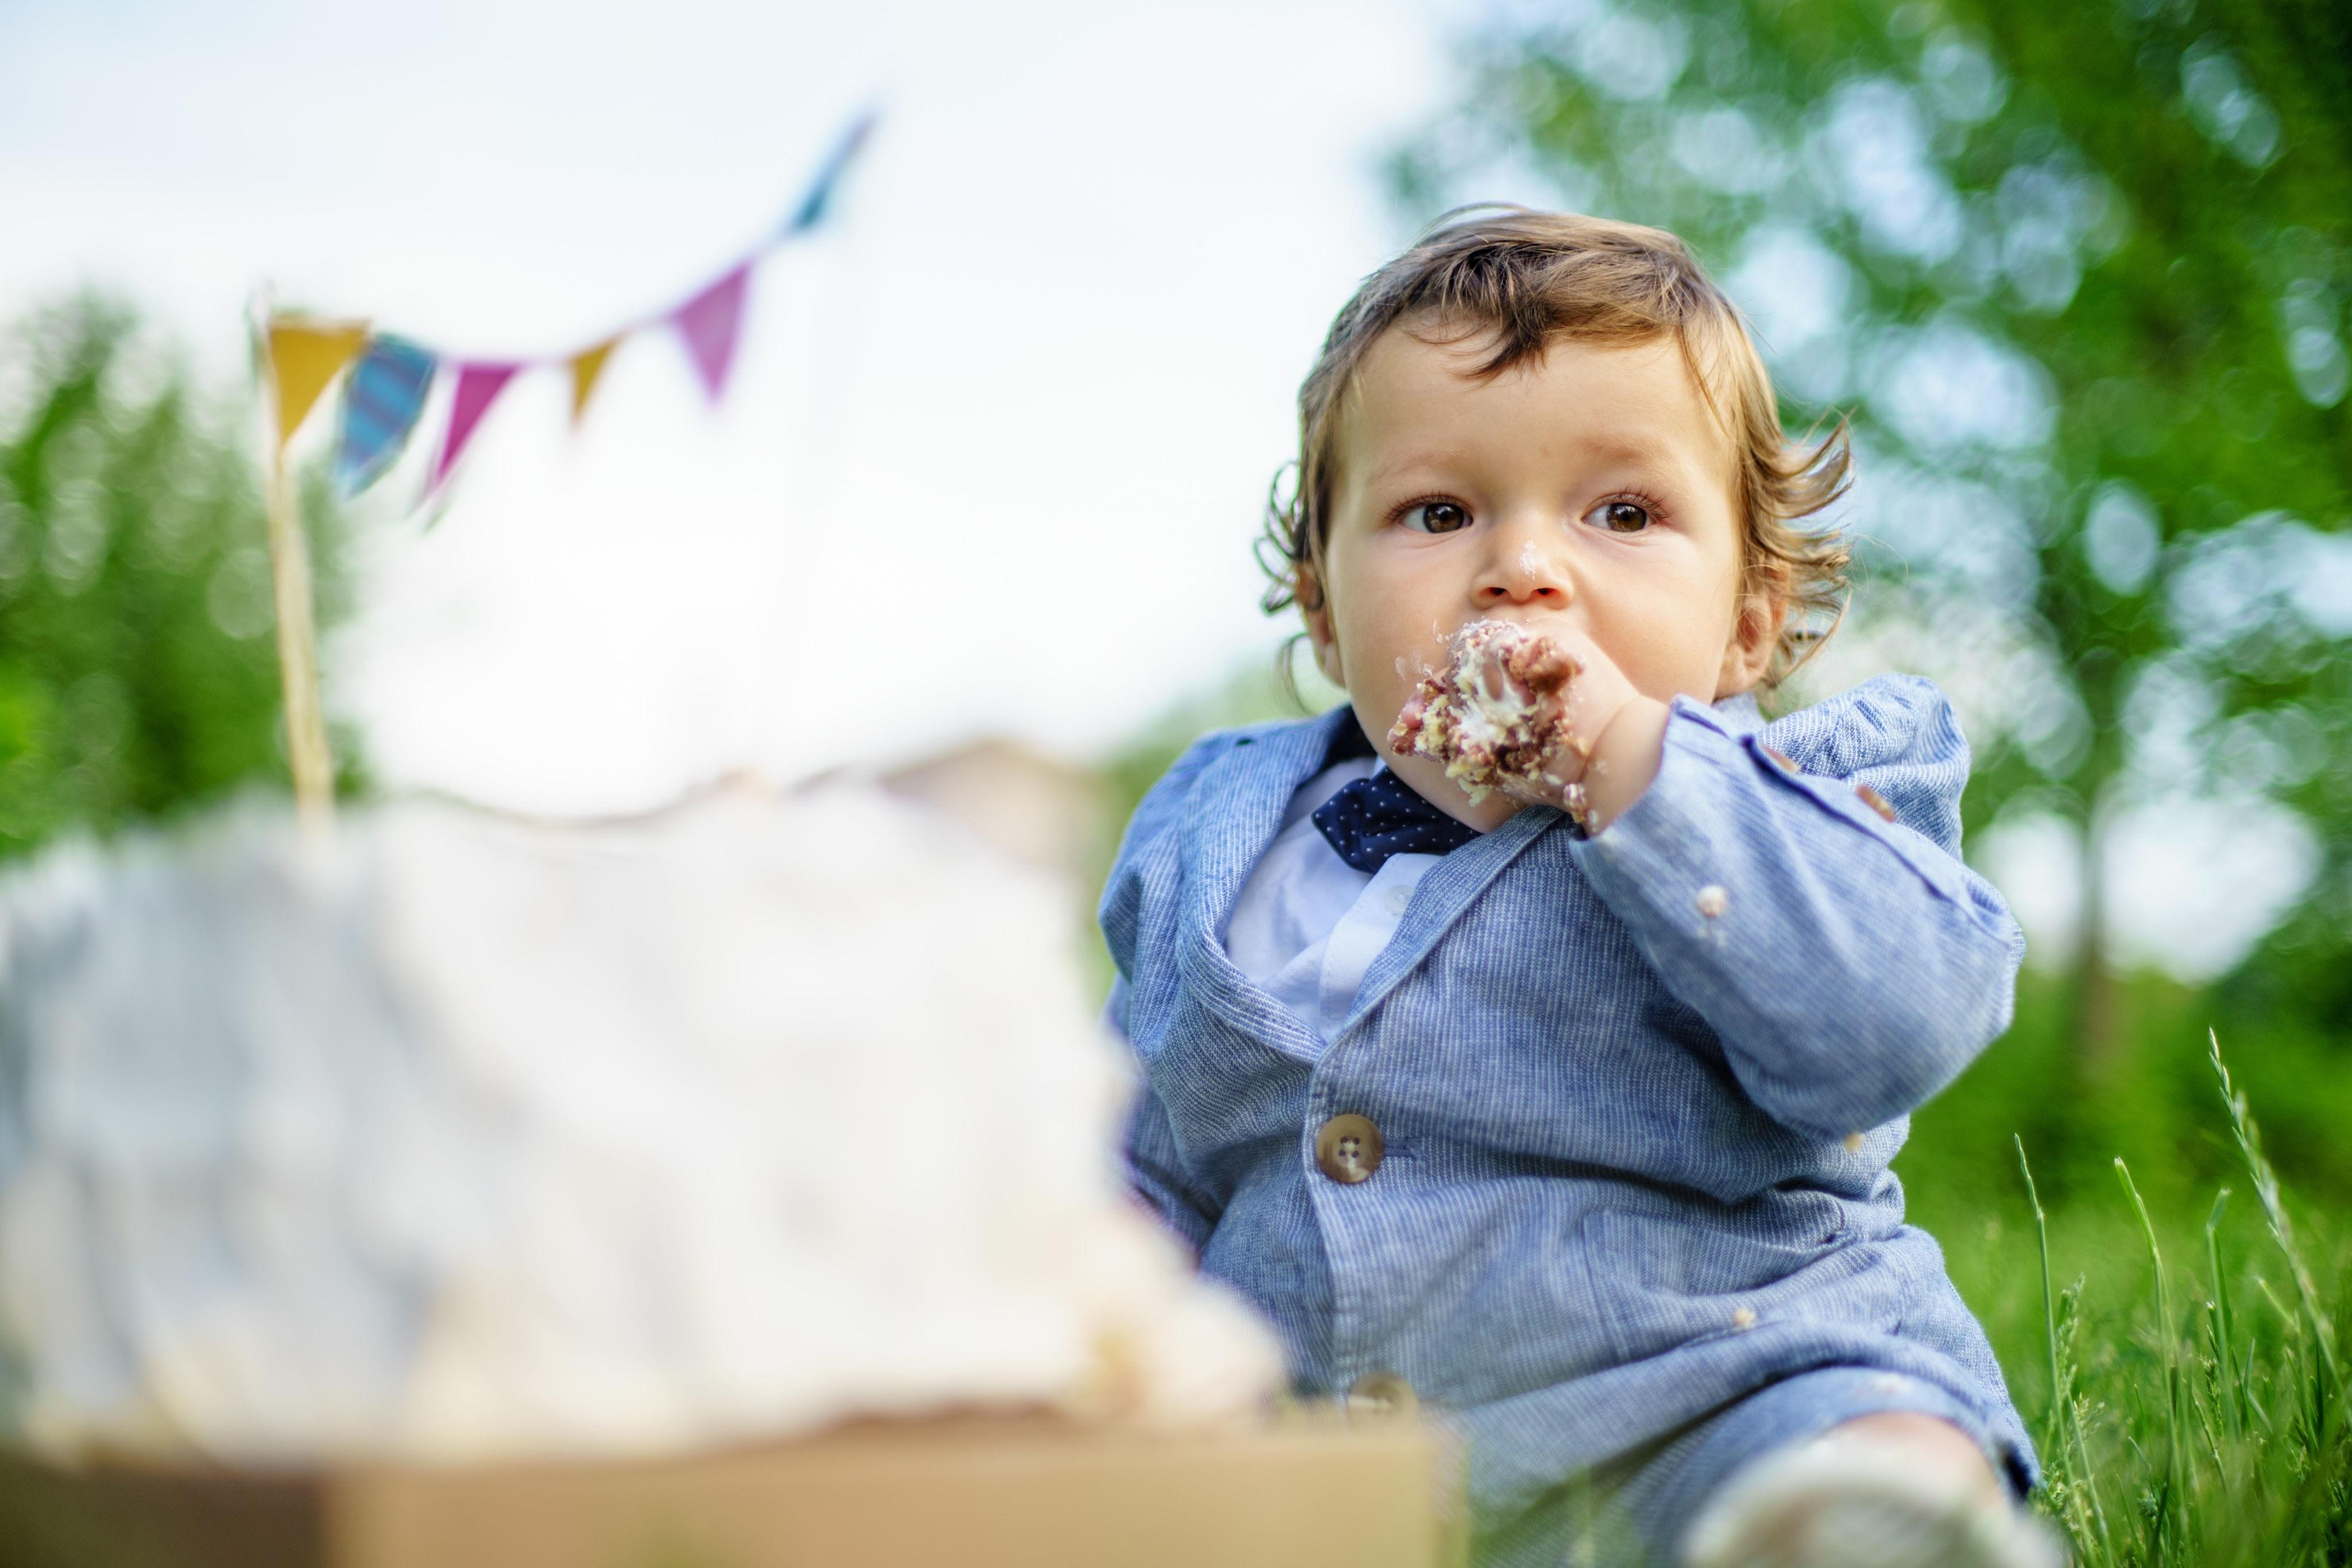 best-dressed-for-first-birthday-boy